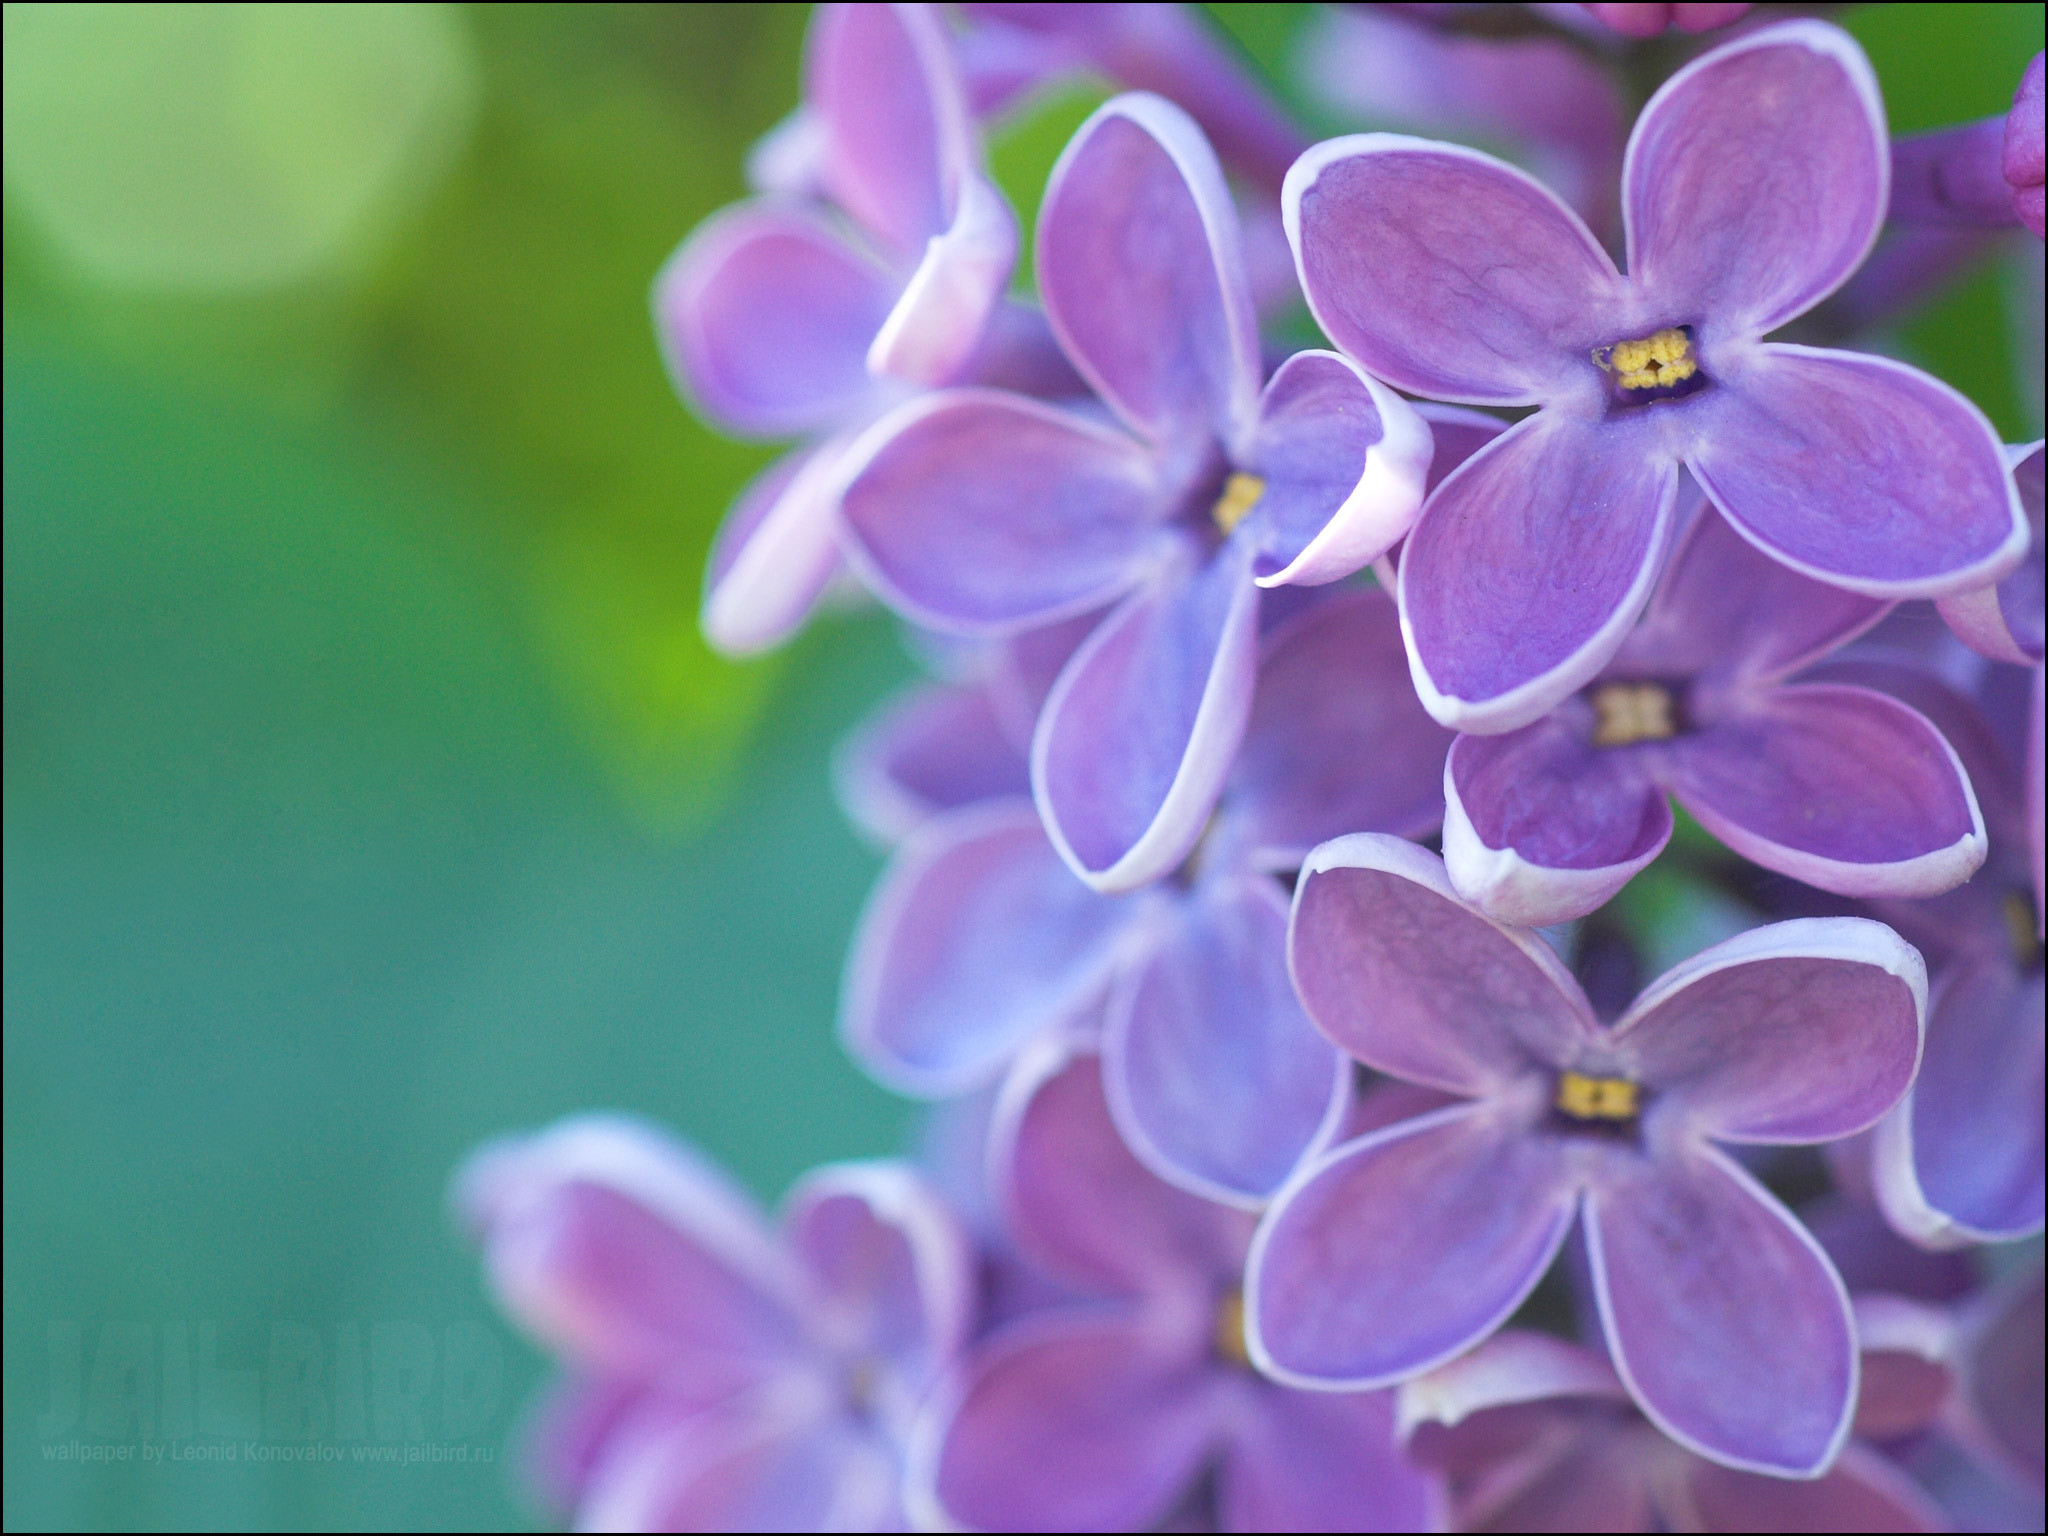 Pin Liliac  Violet Backgrounds Free on Pinterest HD Wallpaper